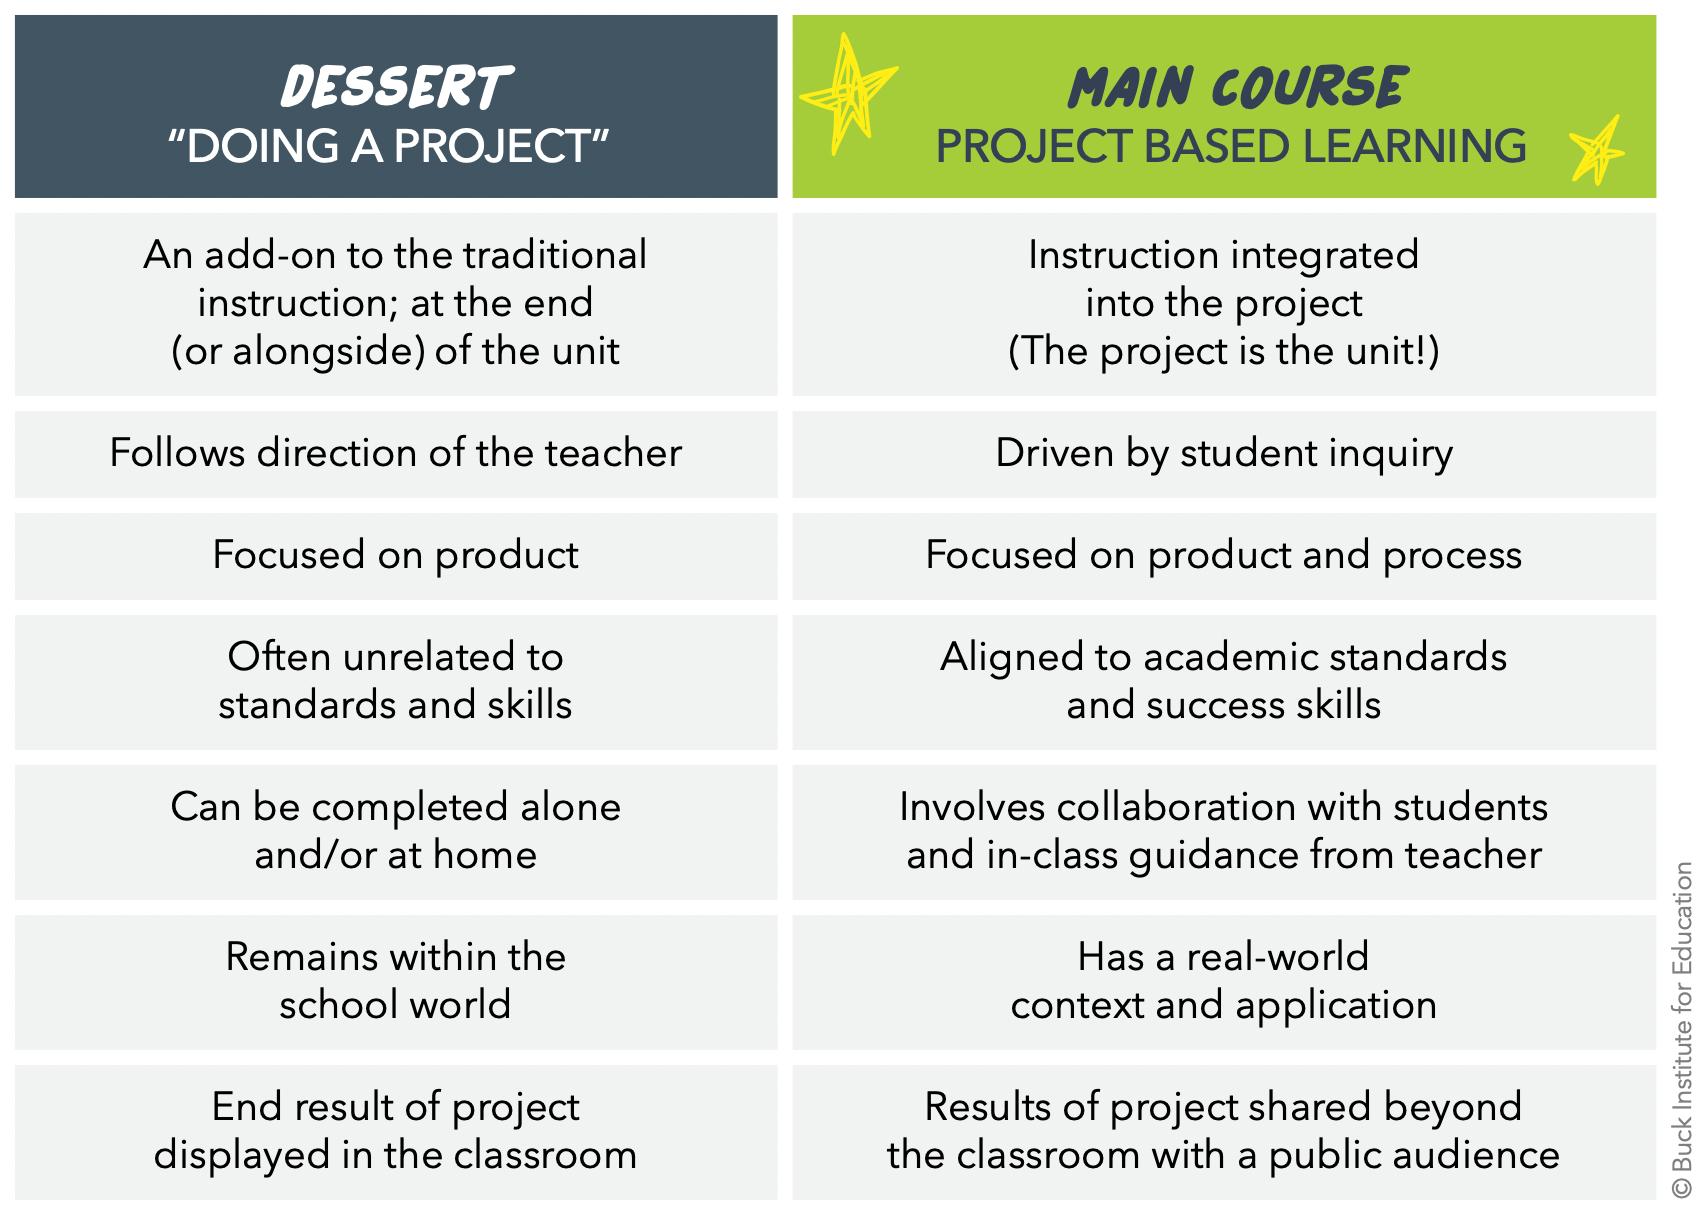 Dessert vs Main Course PBL